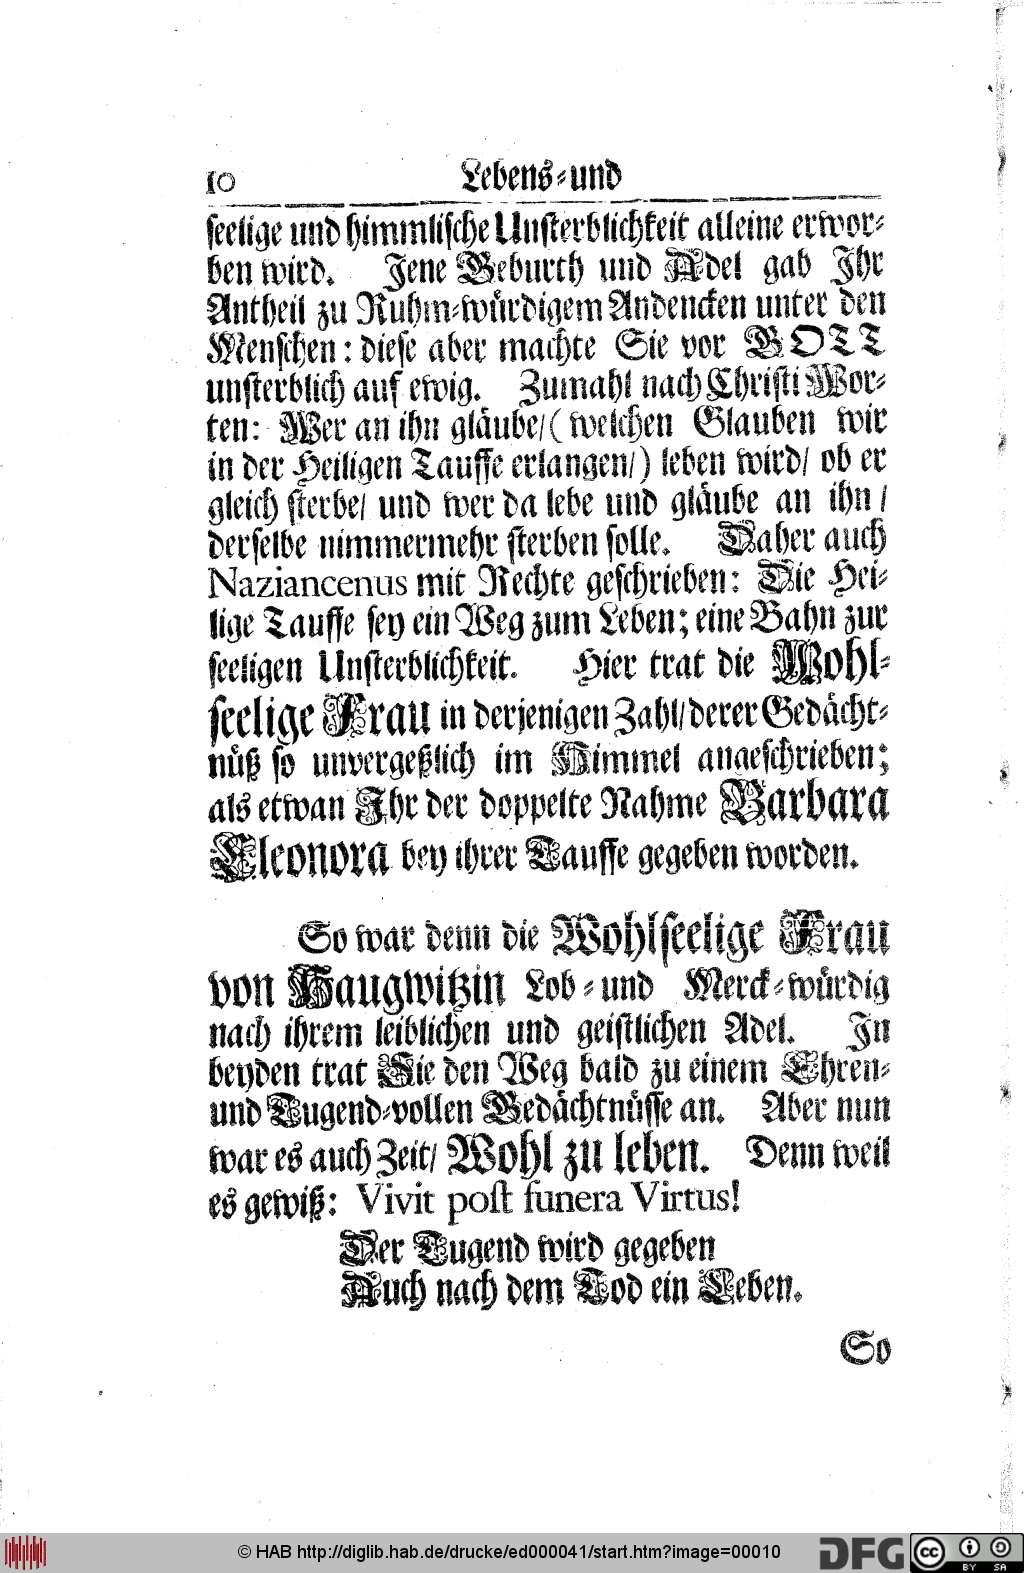 http://diglib.hab.de/drucke/ed000041/00010.jpg